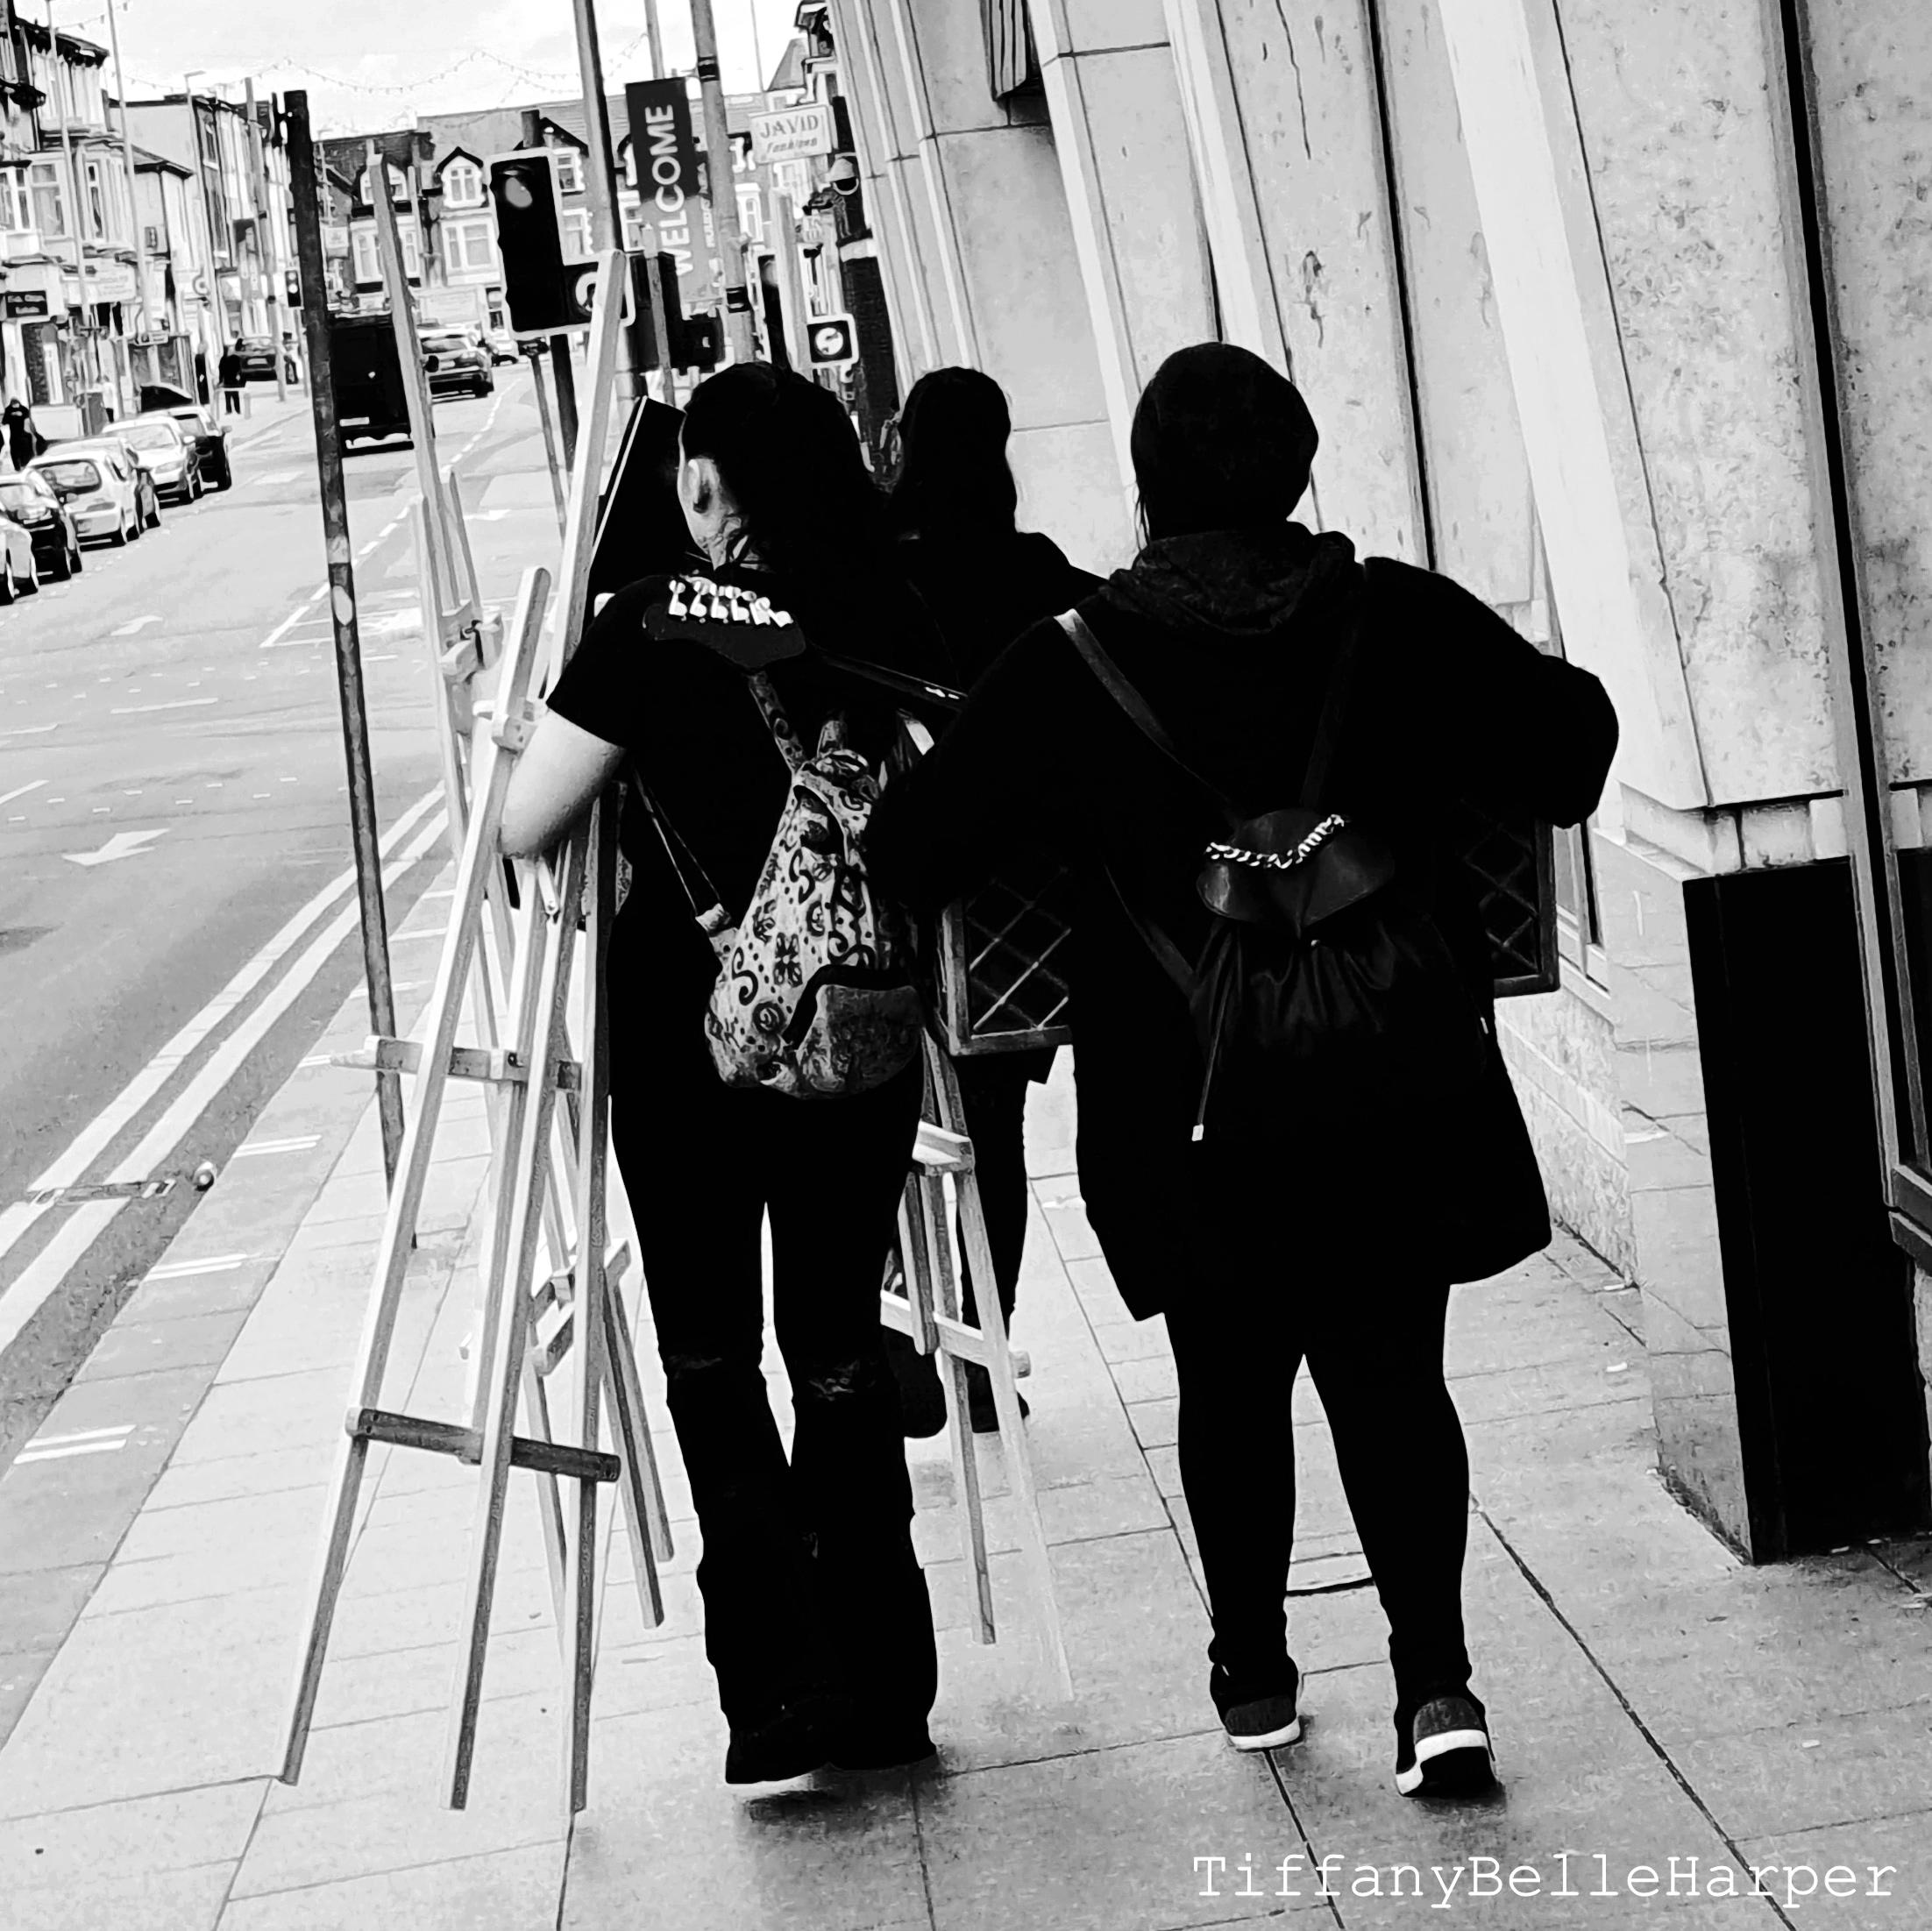 StreetArtists